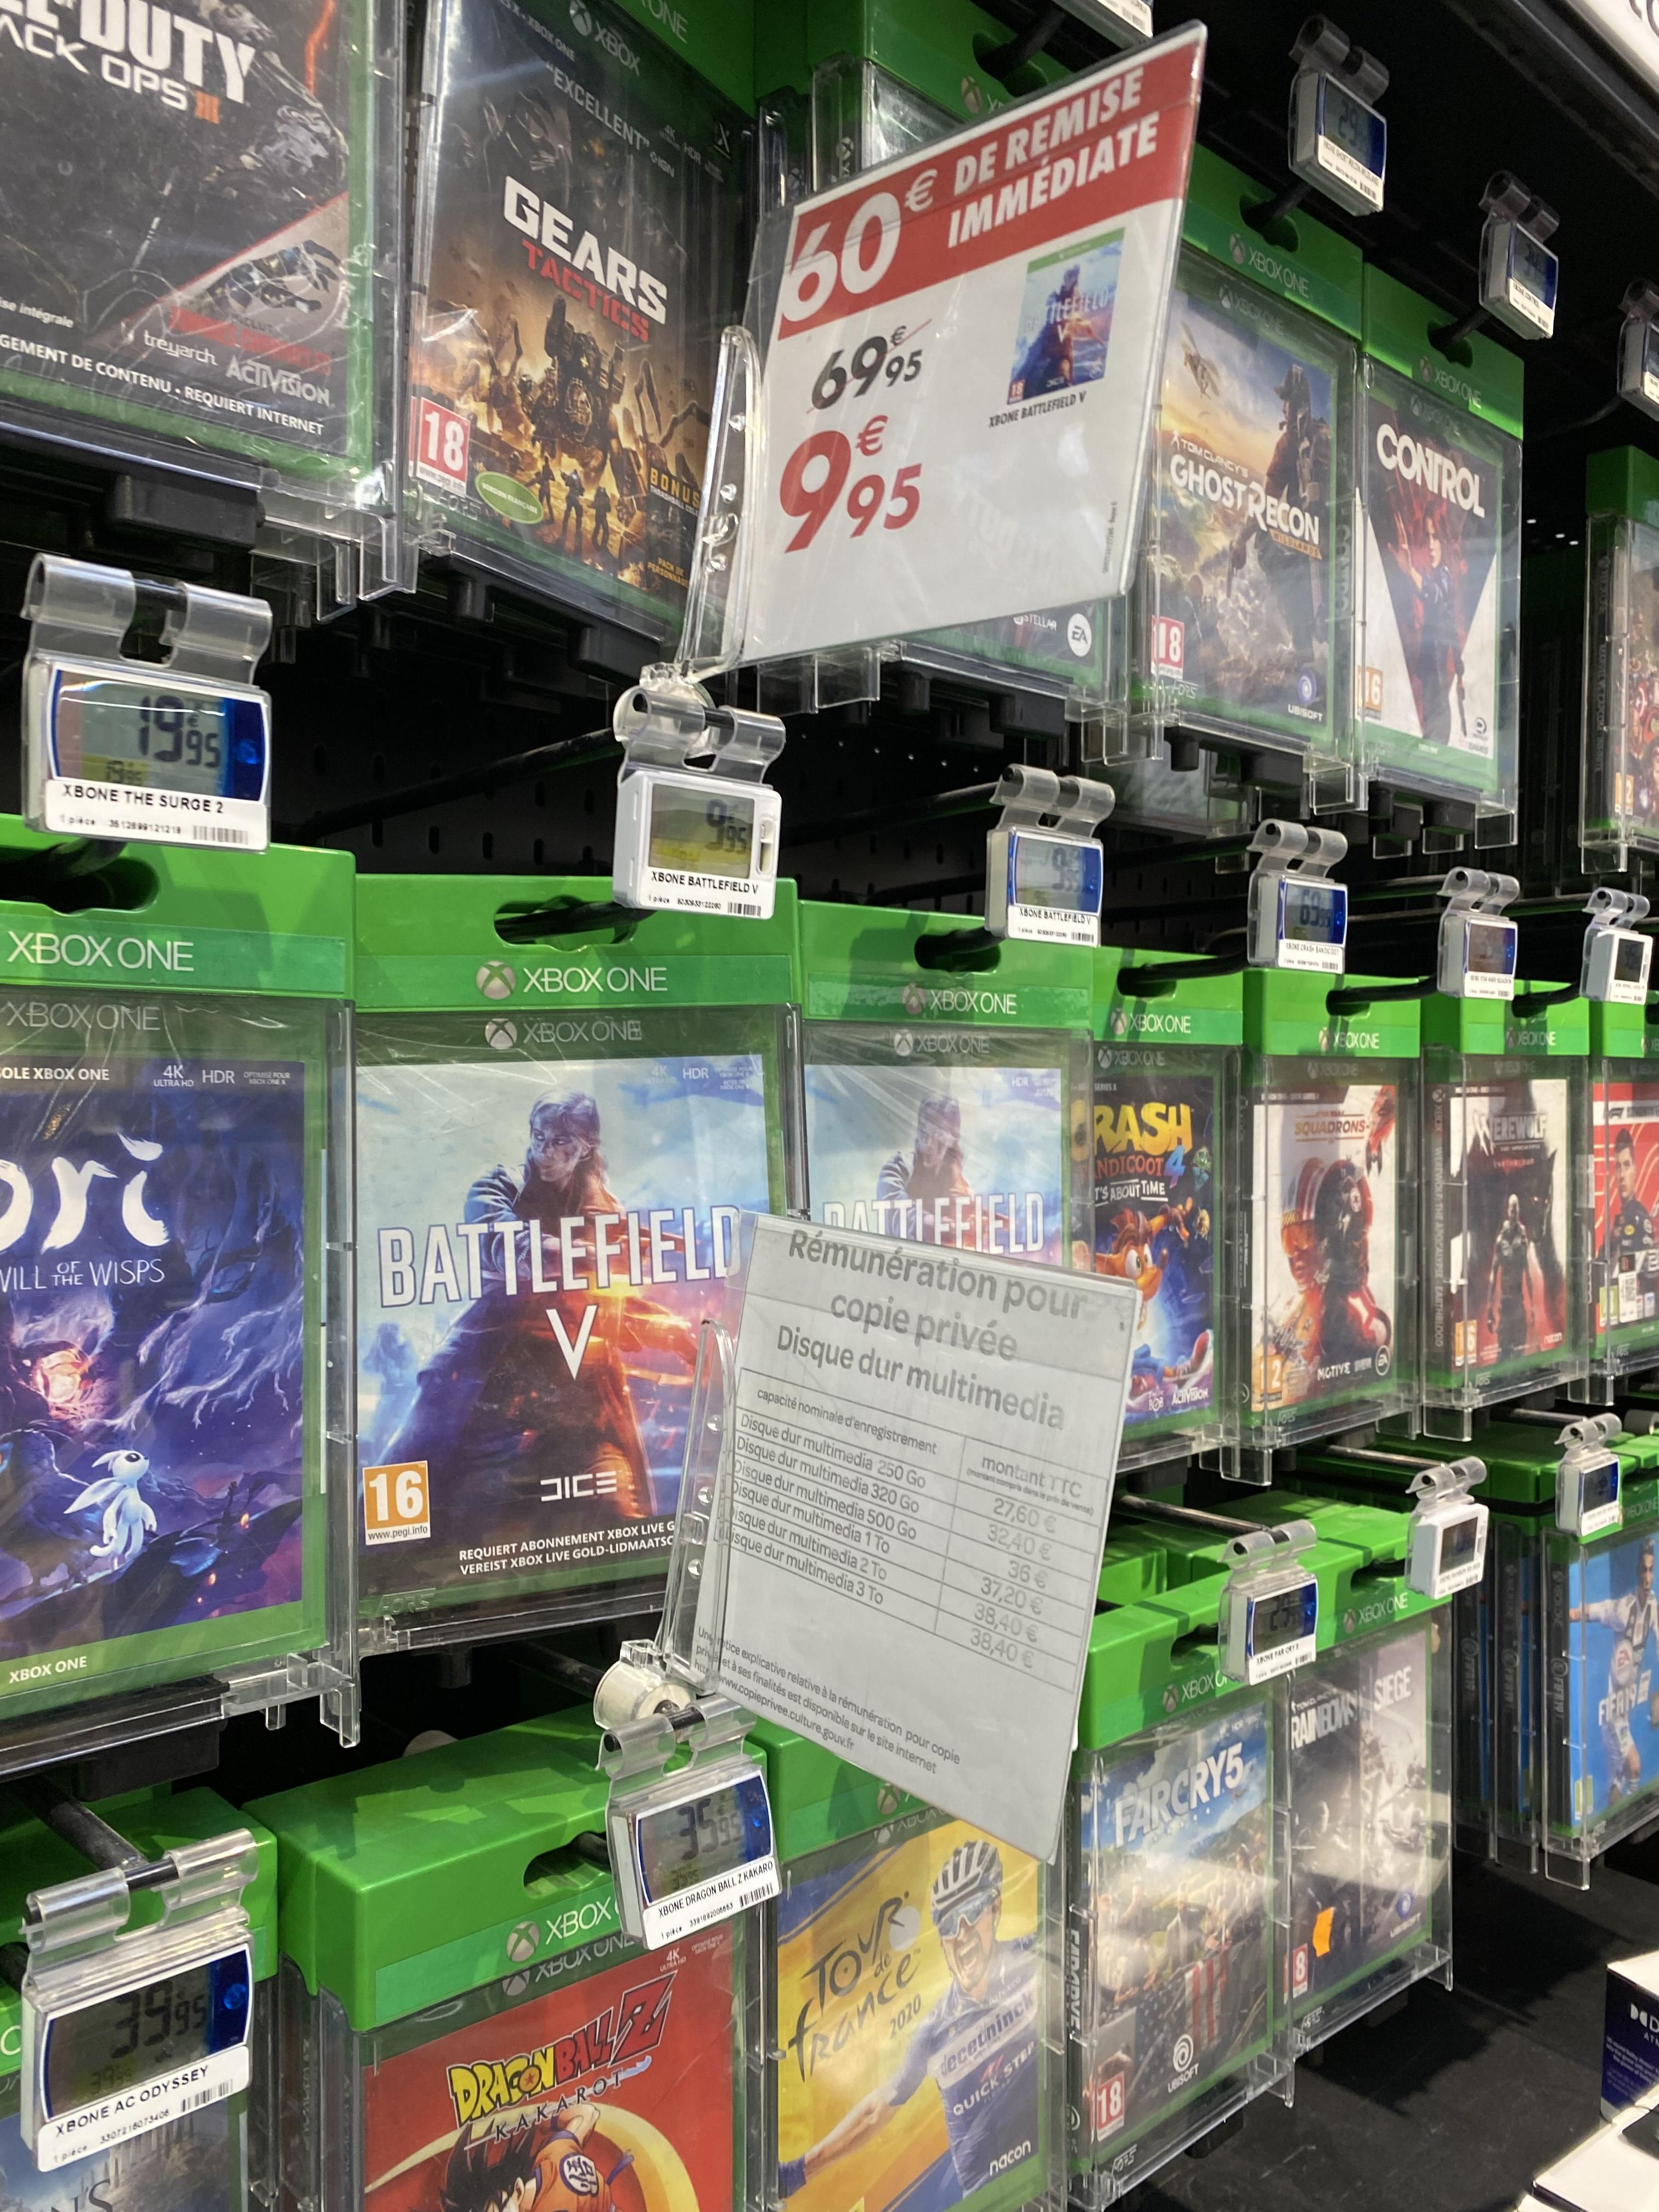 Battlefield V sur Xbox One - Merignac (33)